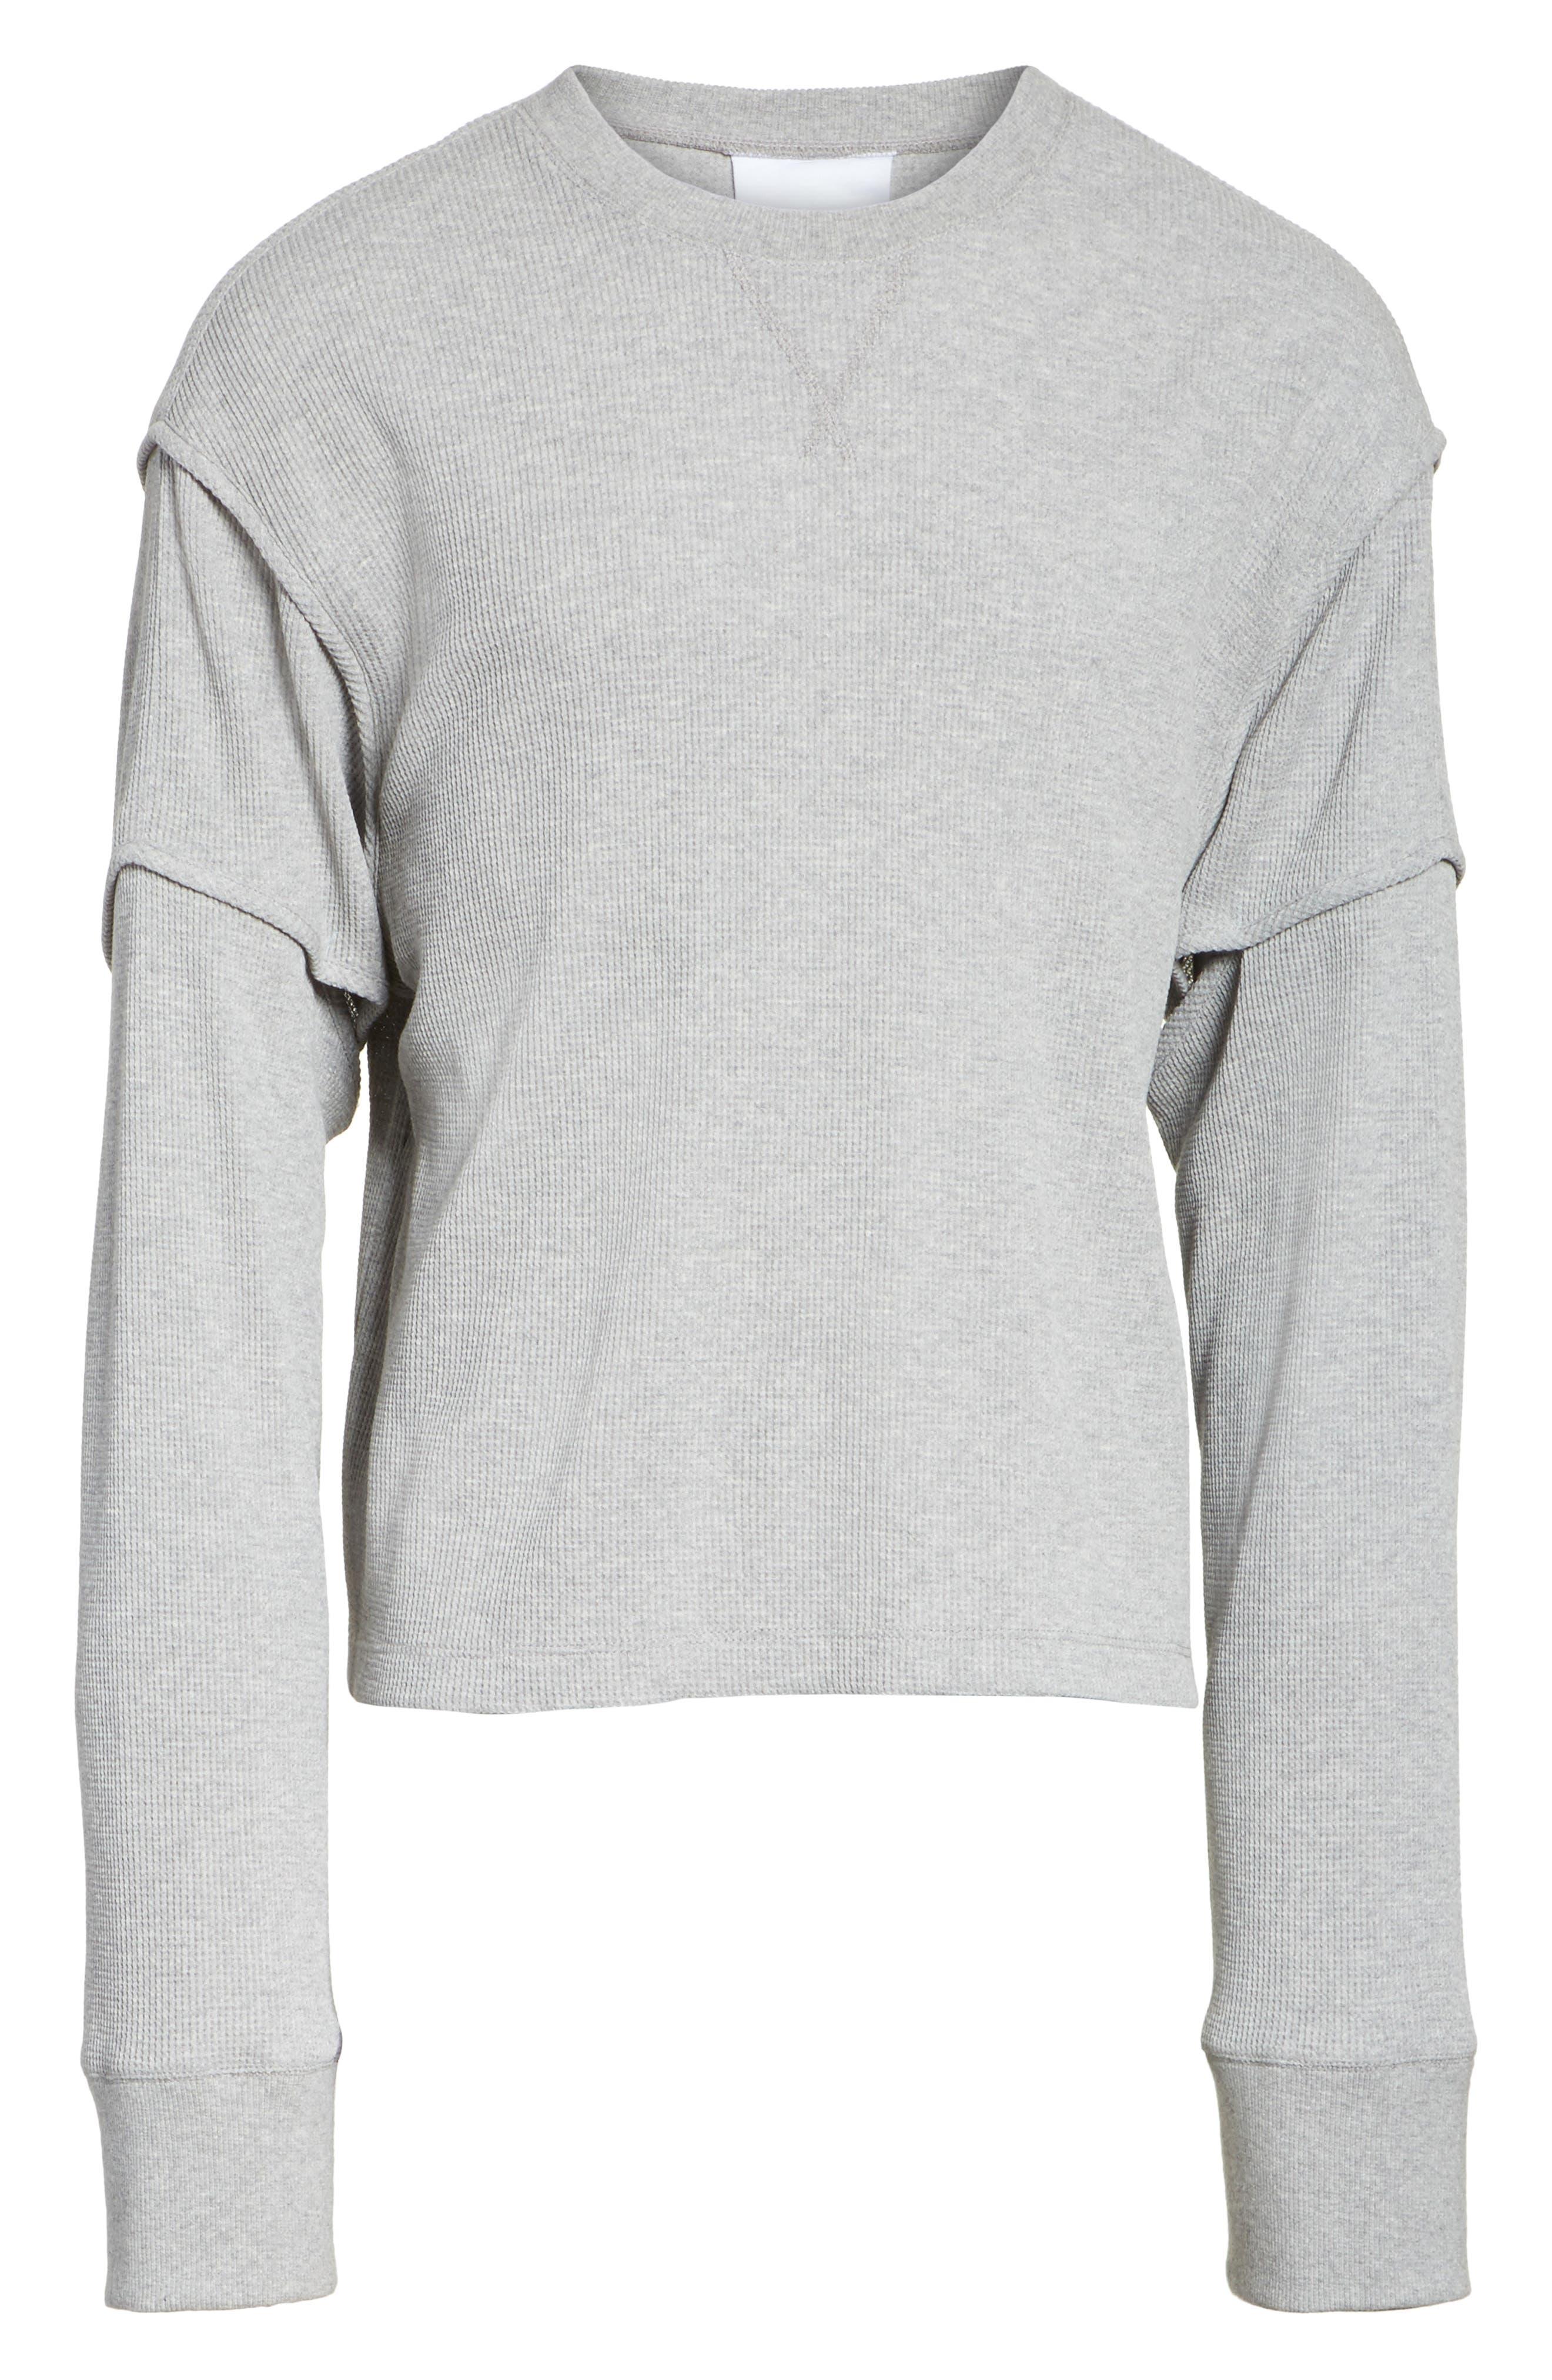 Military Panel Sleeve Thermal Shirt,                             Alternate thumbnail 6, color,                             029